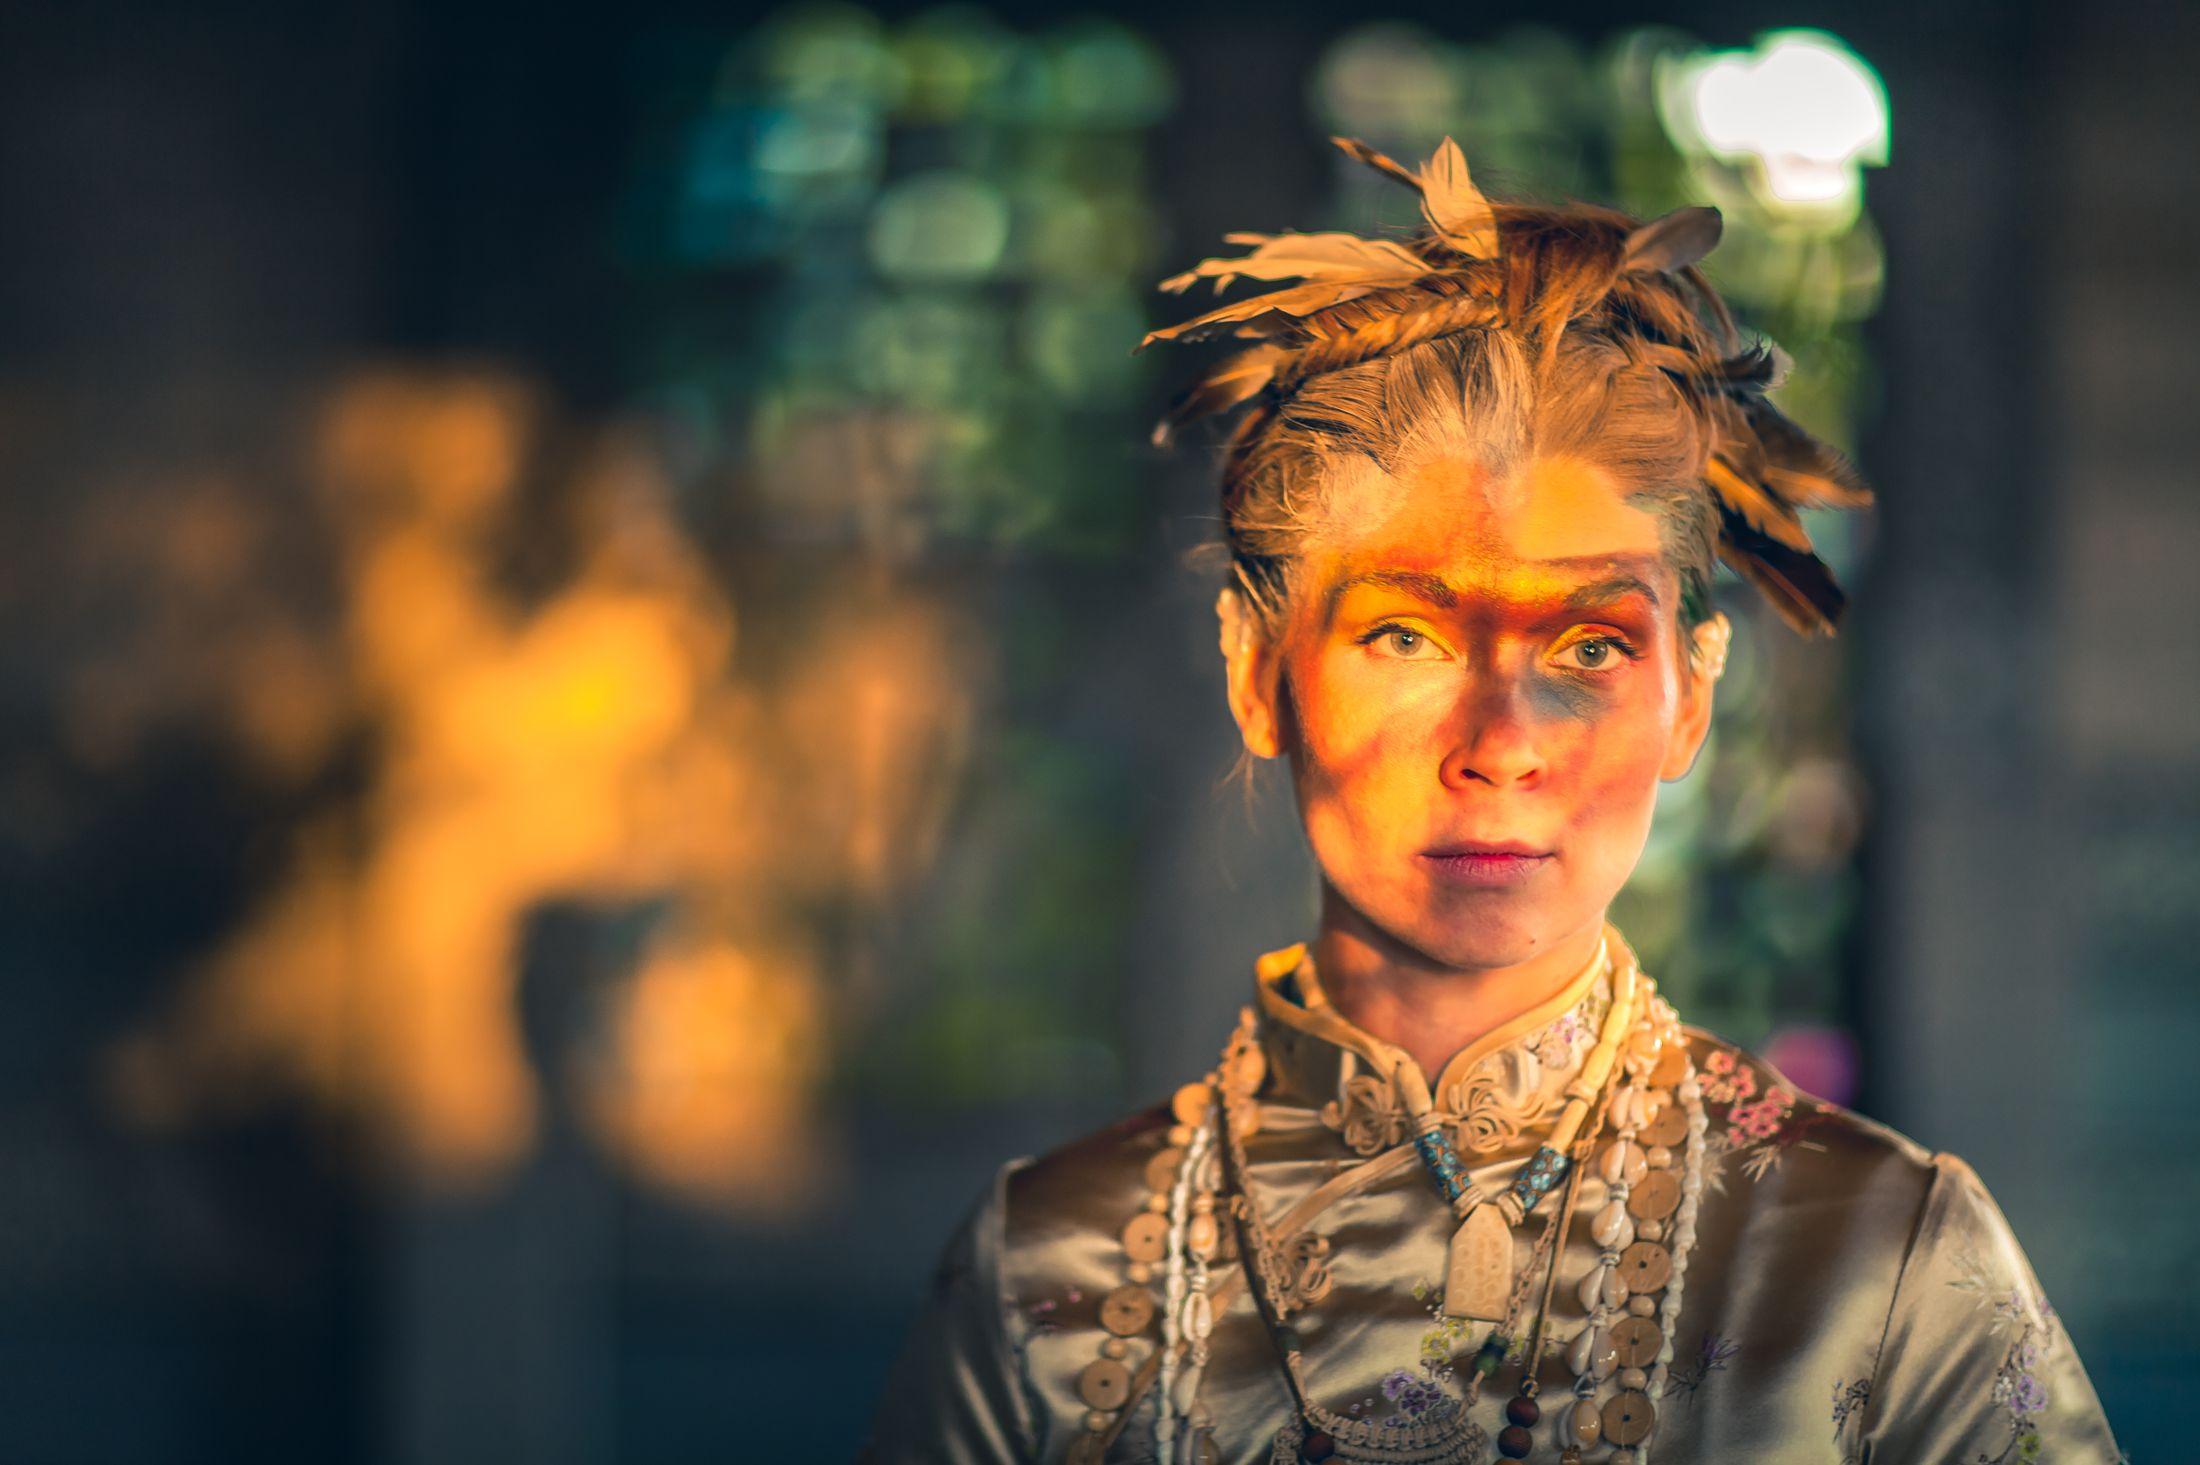 Electric Forest yoga LED light nomad festival style ethnic global fashion shoot warpaint tribal 19.jpg